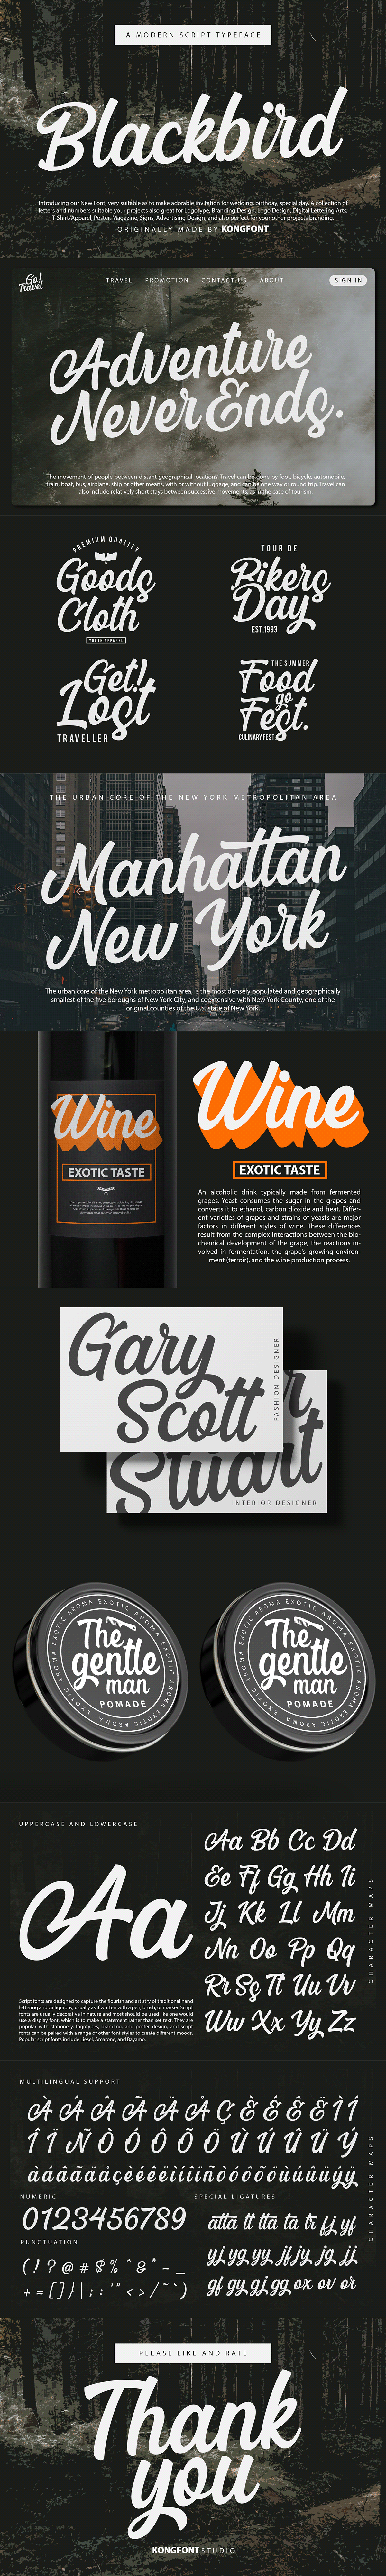 Birthday blackbird branding  font fonts Invitation Logotype Script wedding